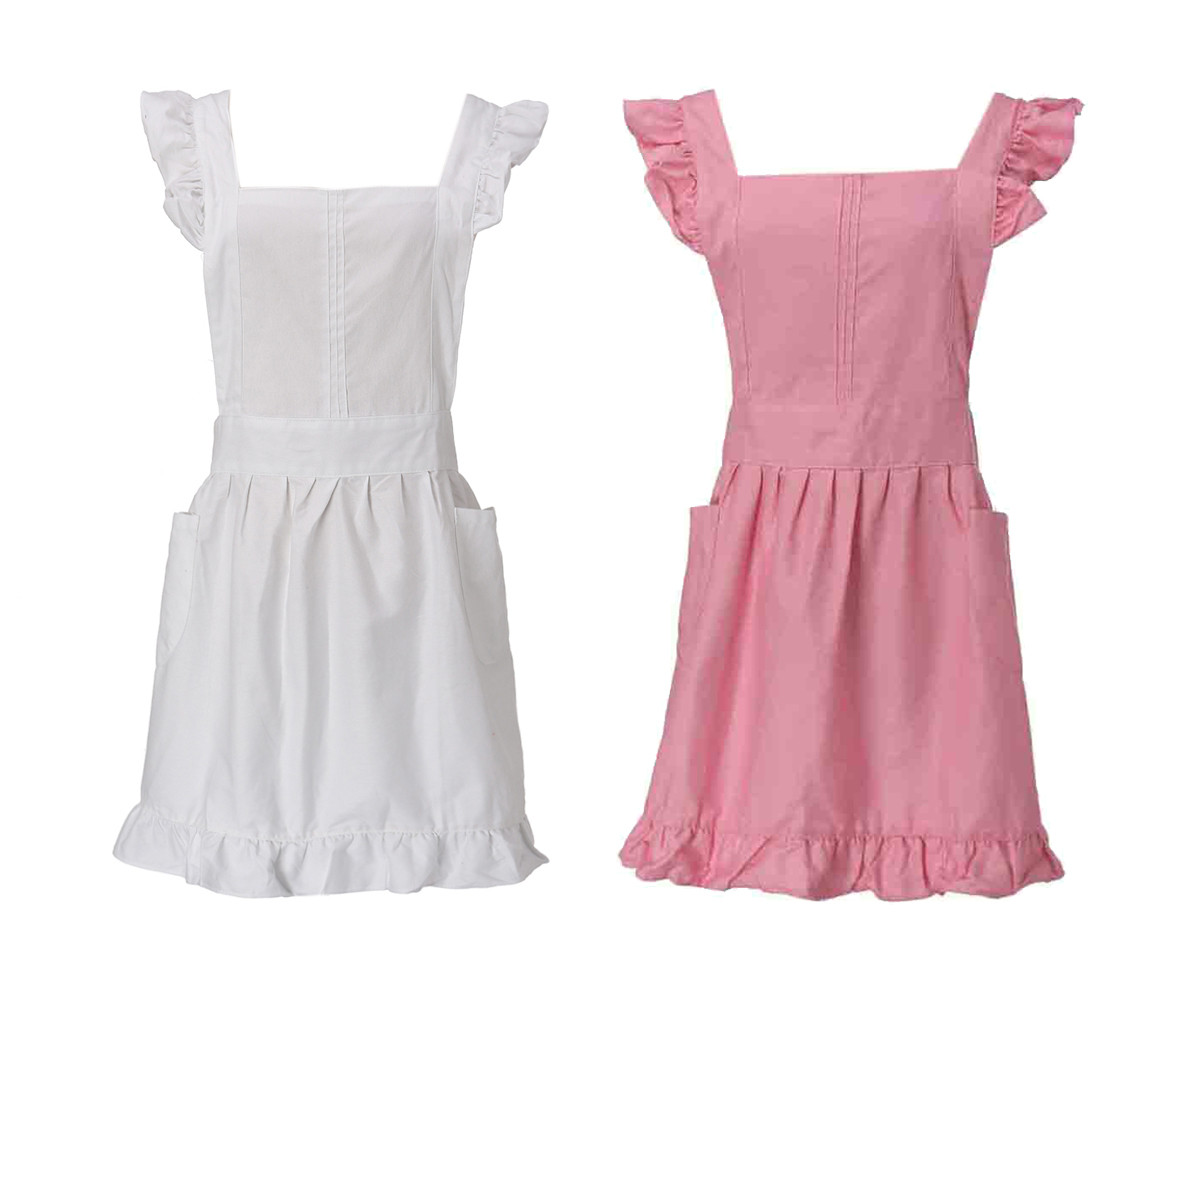 White aprons for sale - White Bib Aprons